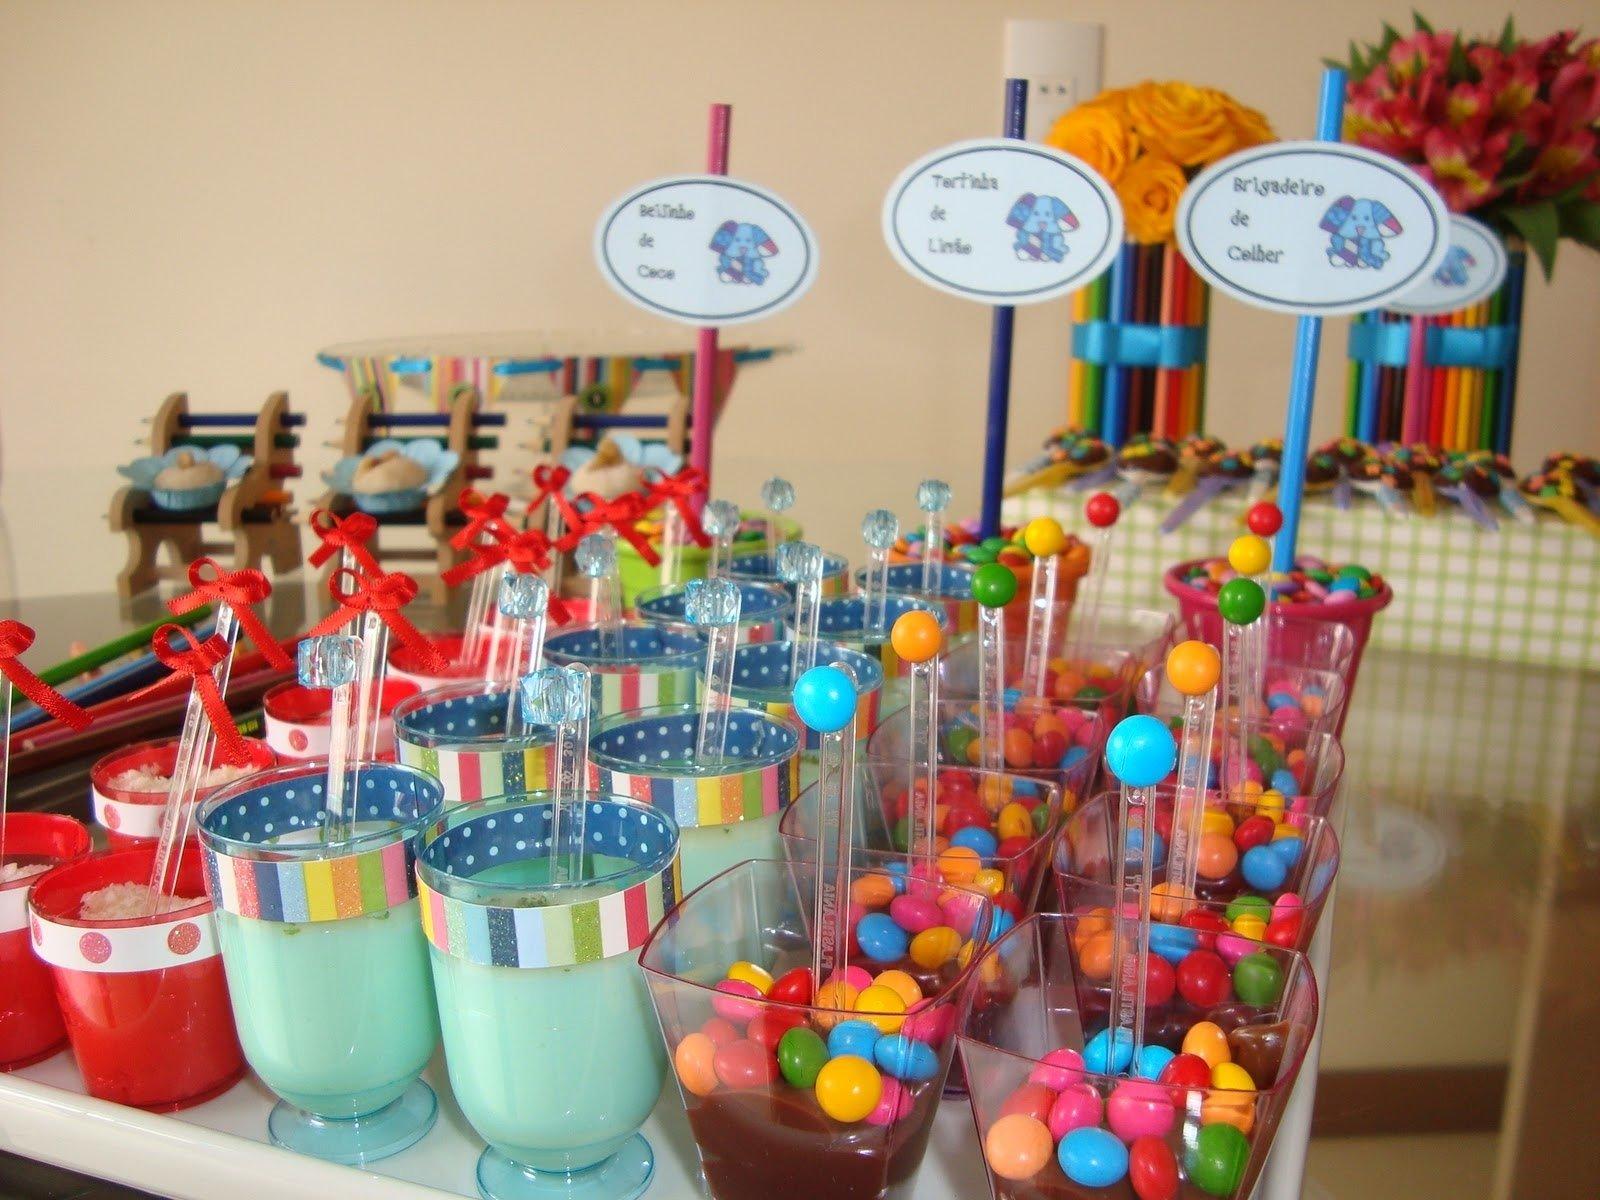 10 Cute Party Favors Ideas For Kids fun kids birthday party ideas birthday party ideas 2020